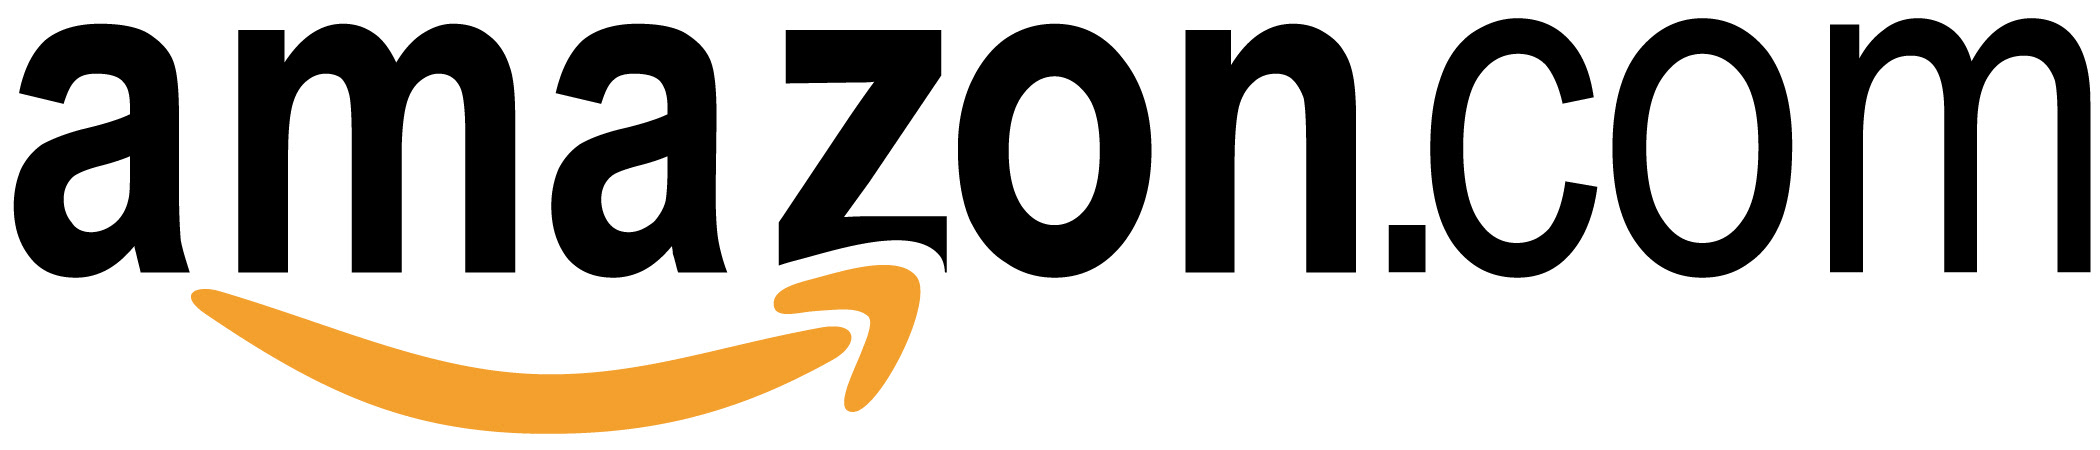 2100x450 Amazon Logo Vector Png Transparent Amazon Logo Vector.png Images